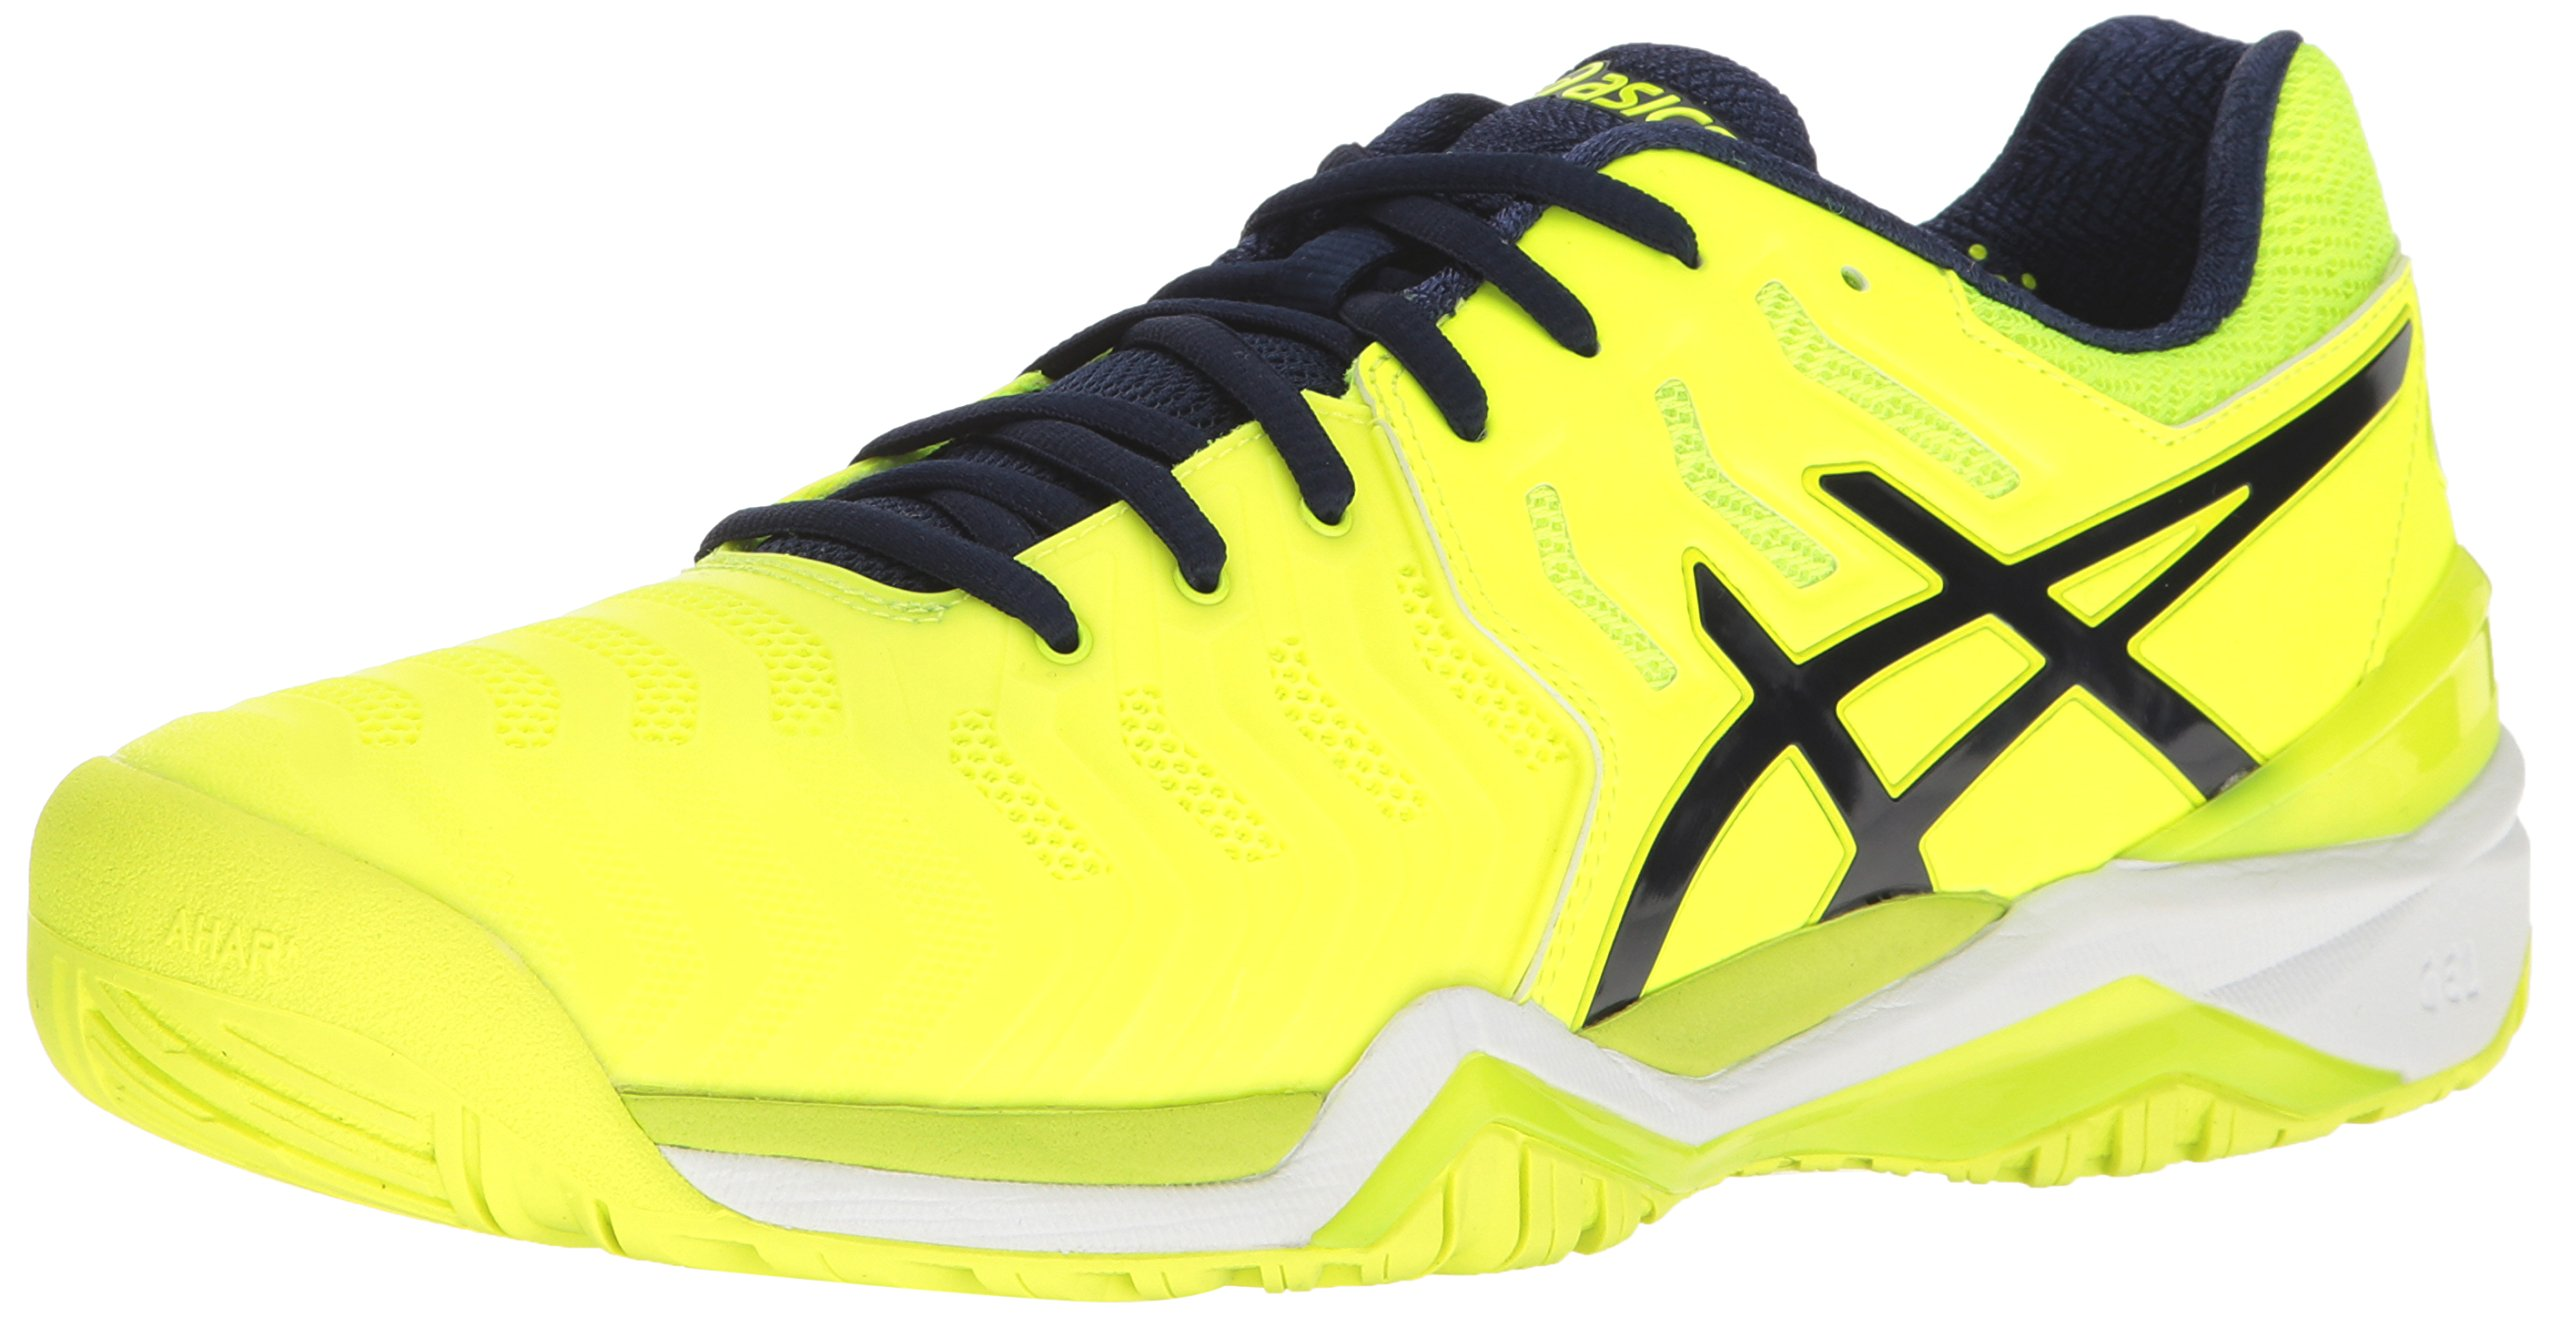 ASICS Men's Gel-Resolution 7 Tennis Shoe, Safety Yellow/Indigo Blue/White, 10.5 M US